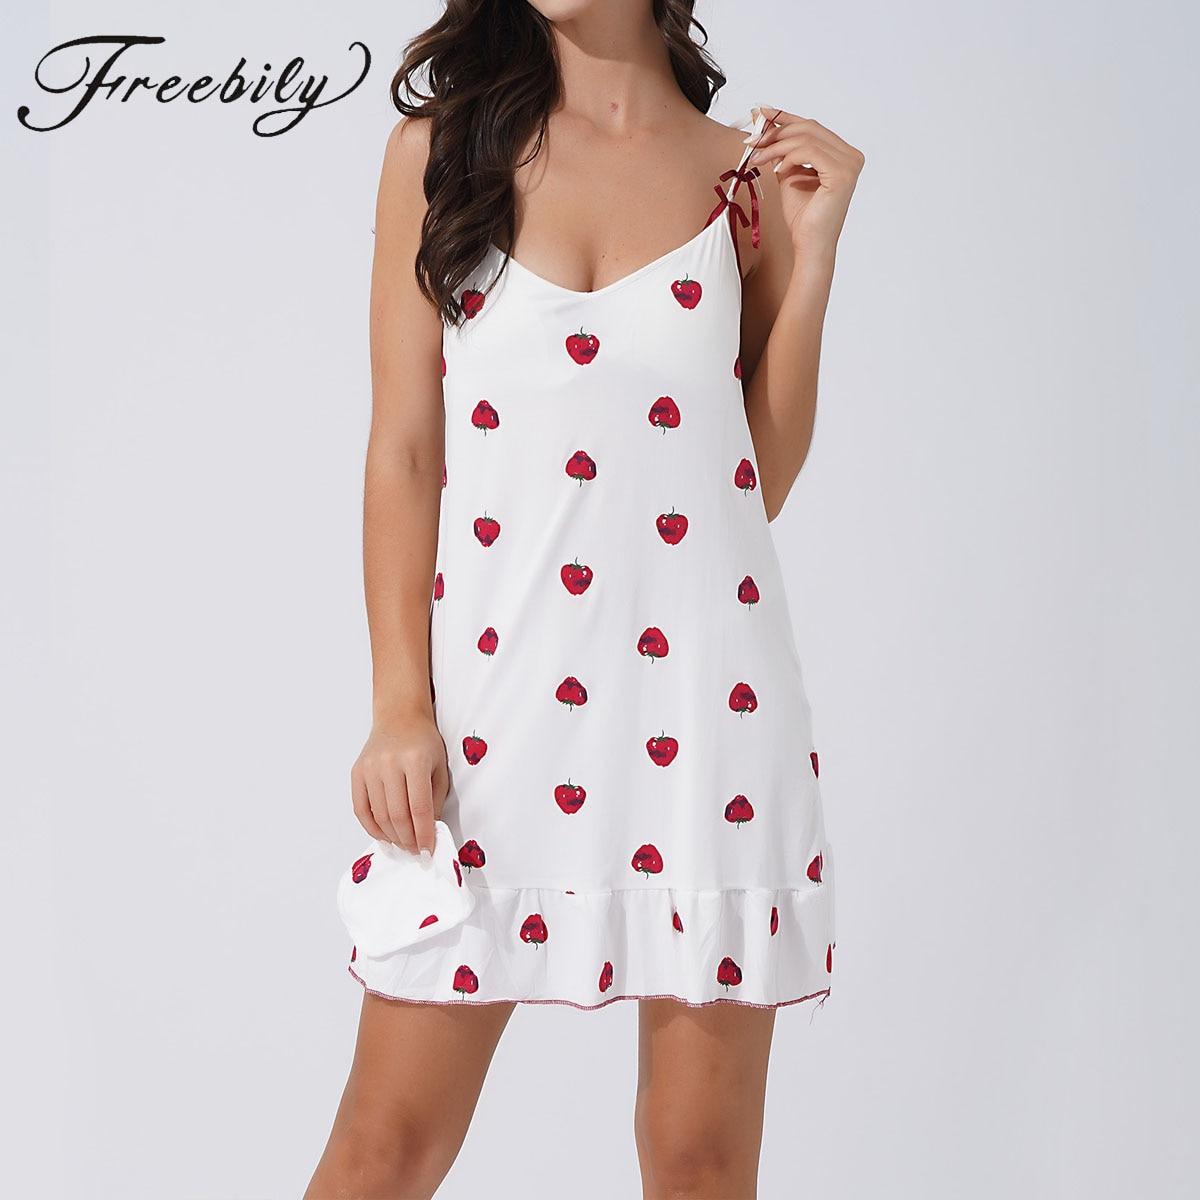 Women Cotton Nightdress Cute Cherry Print Nightgown Bow Sling Sleep Wear Pajama Dress girls bow detail cherry print dip hem dress